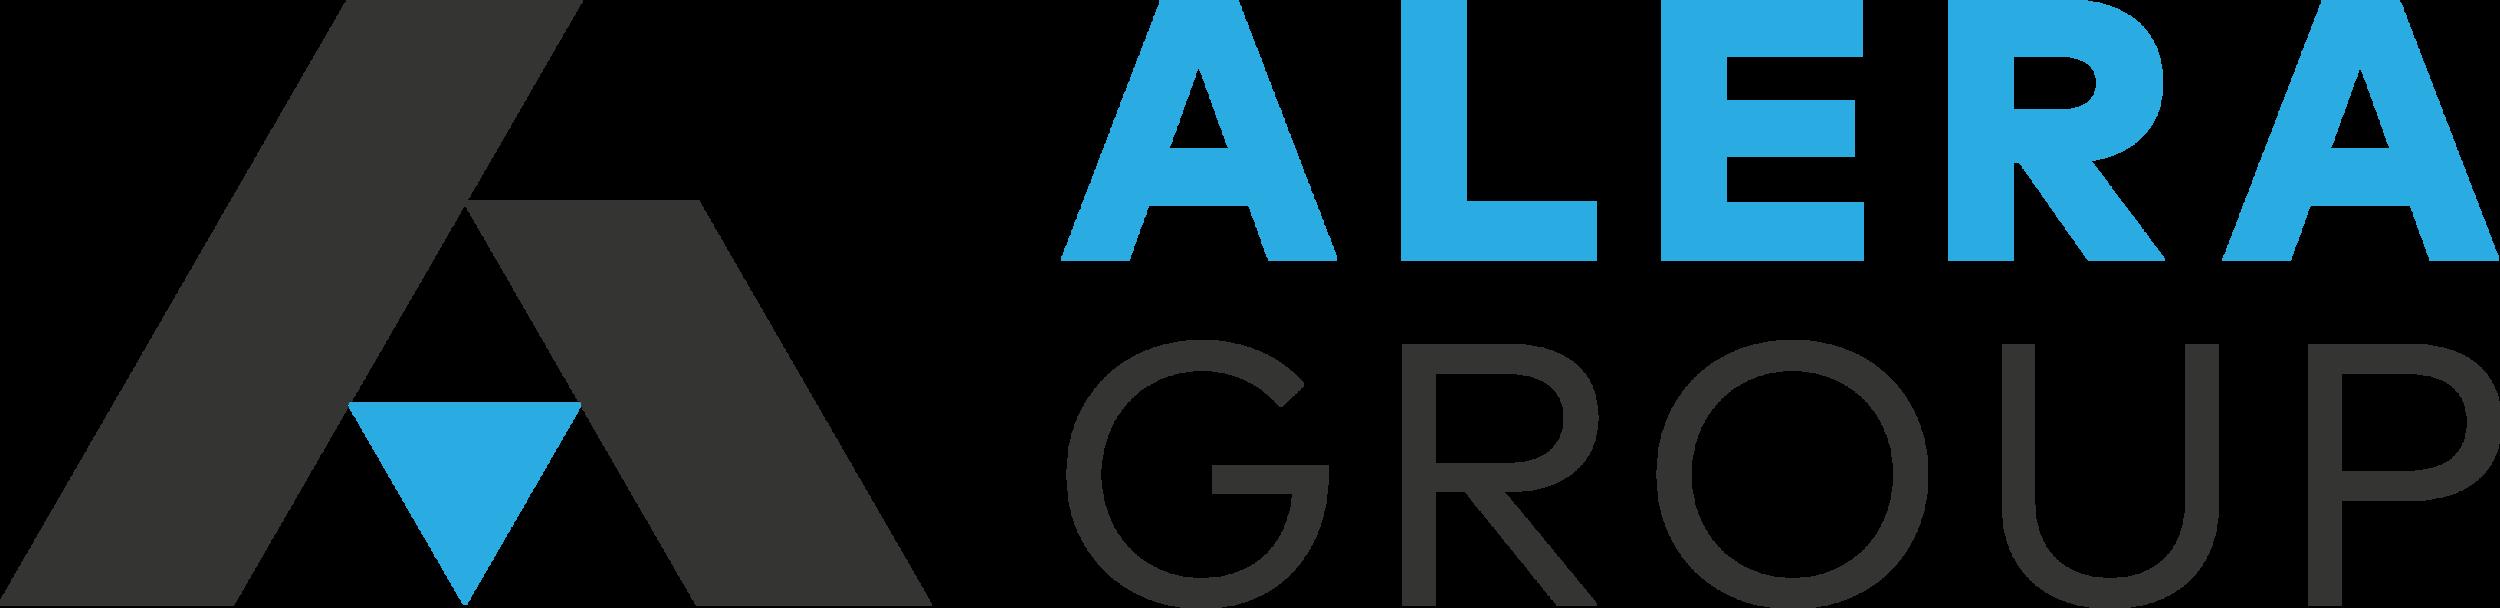 Alera_Logo_AltLockup_CMYK.png